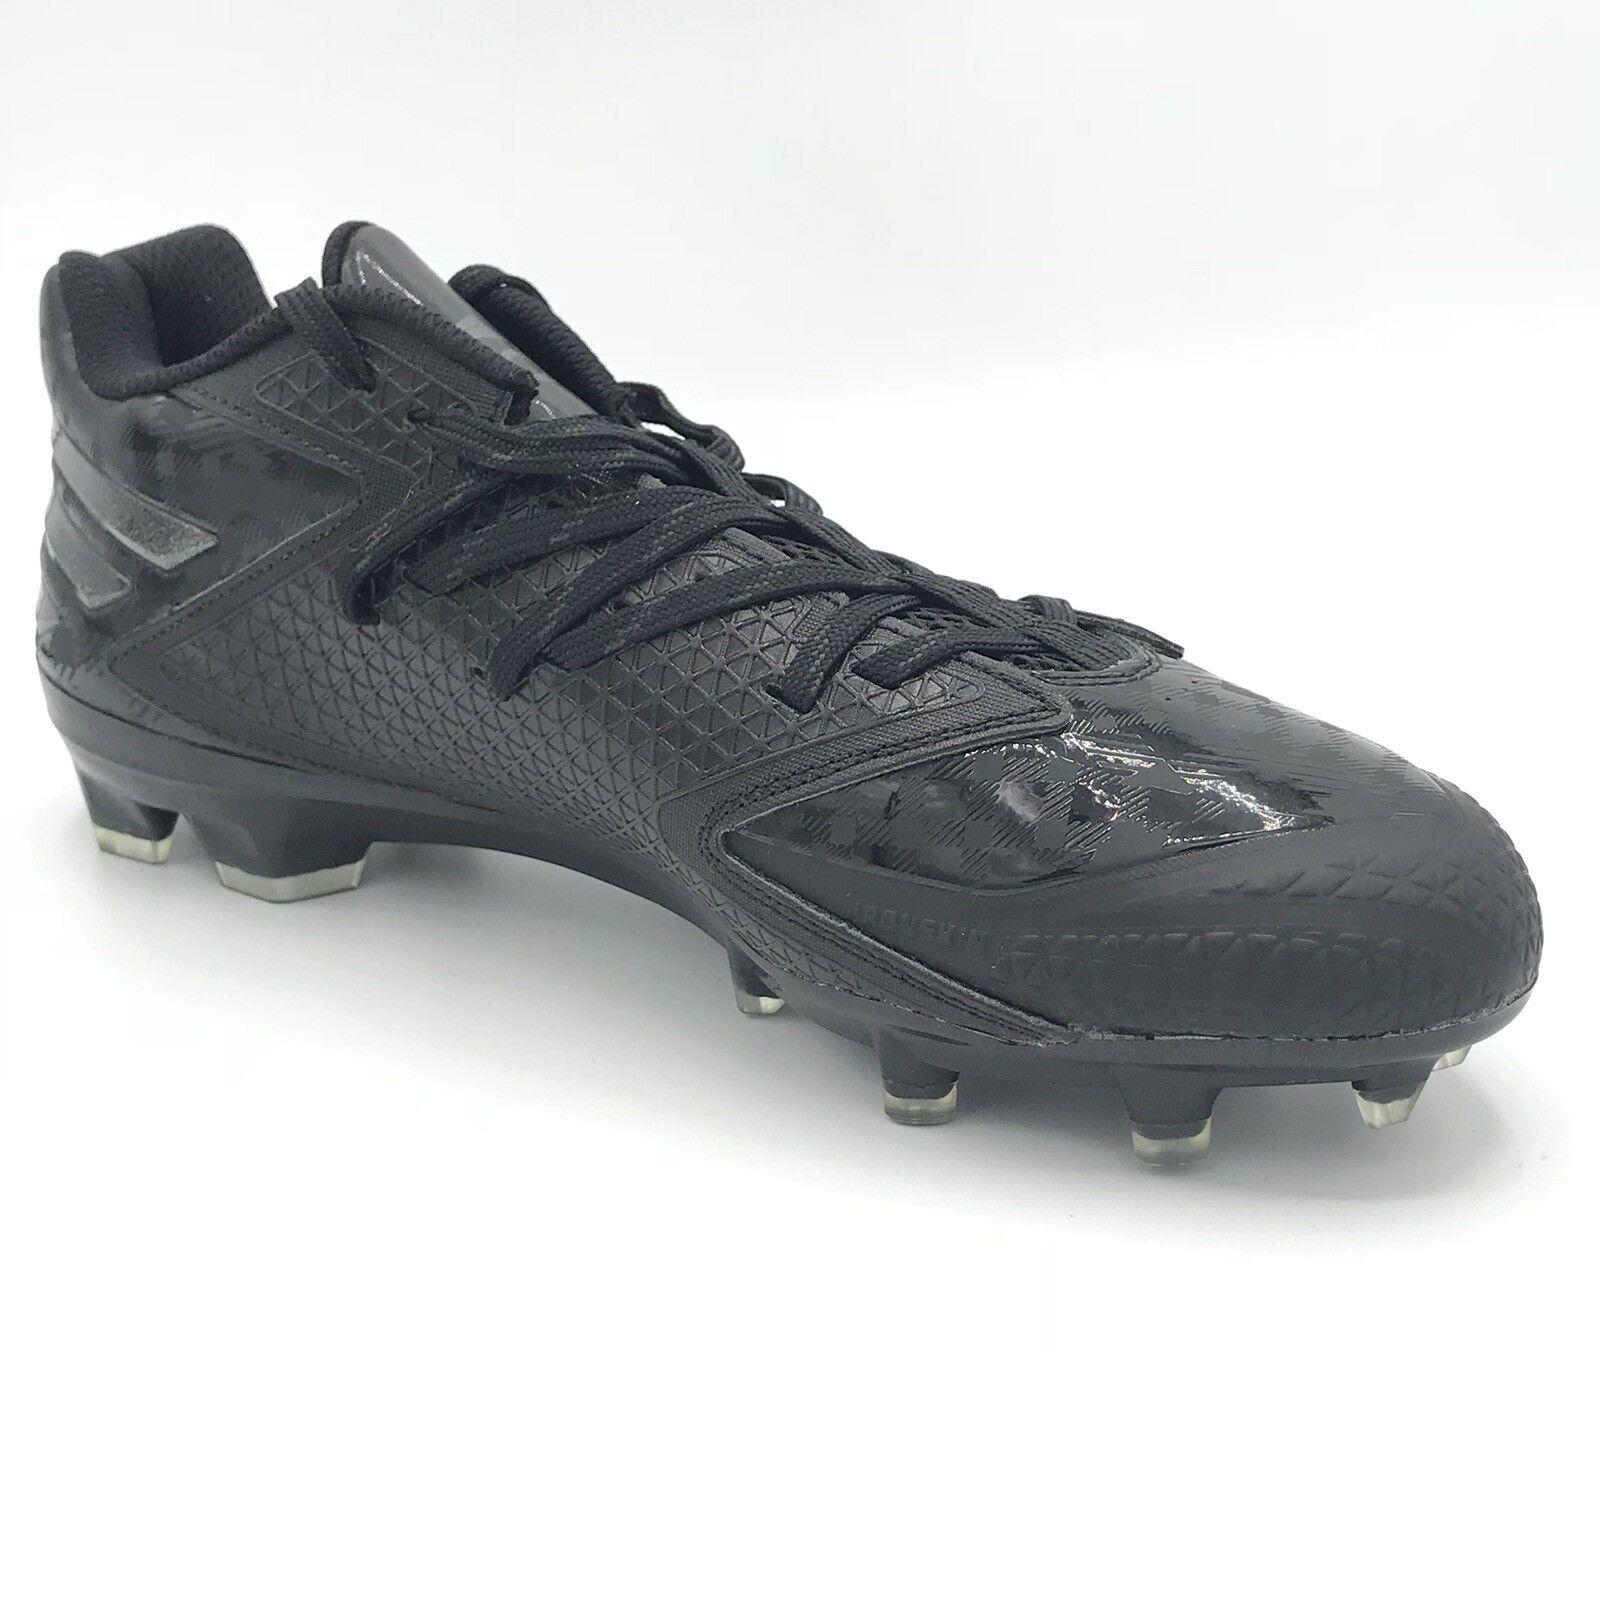 Adidas uomini mostro nero carbonio numero 9 football scarpette arte q16056 | Qualità Affidabile  | Gentiluomo/Signora Scarpa